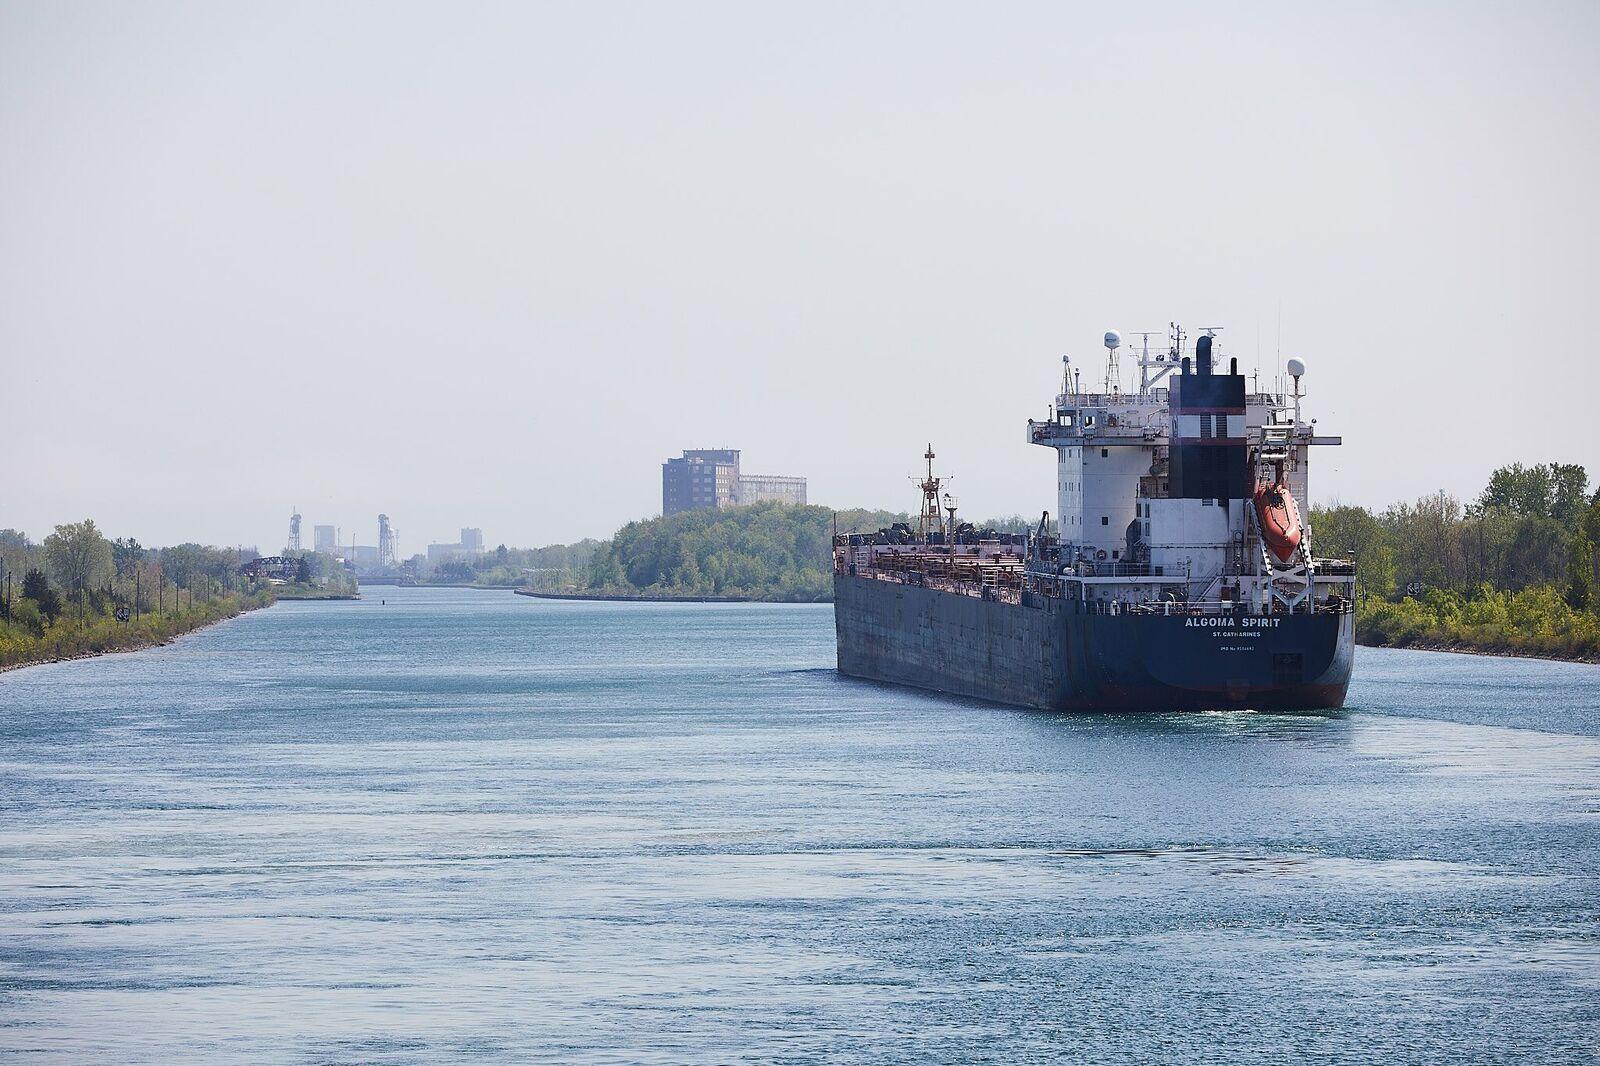 Algoma spirit ship out at sea